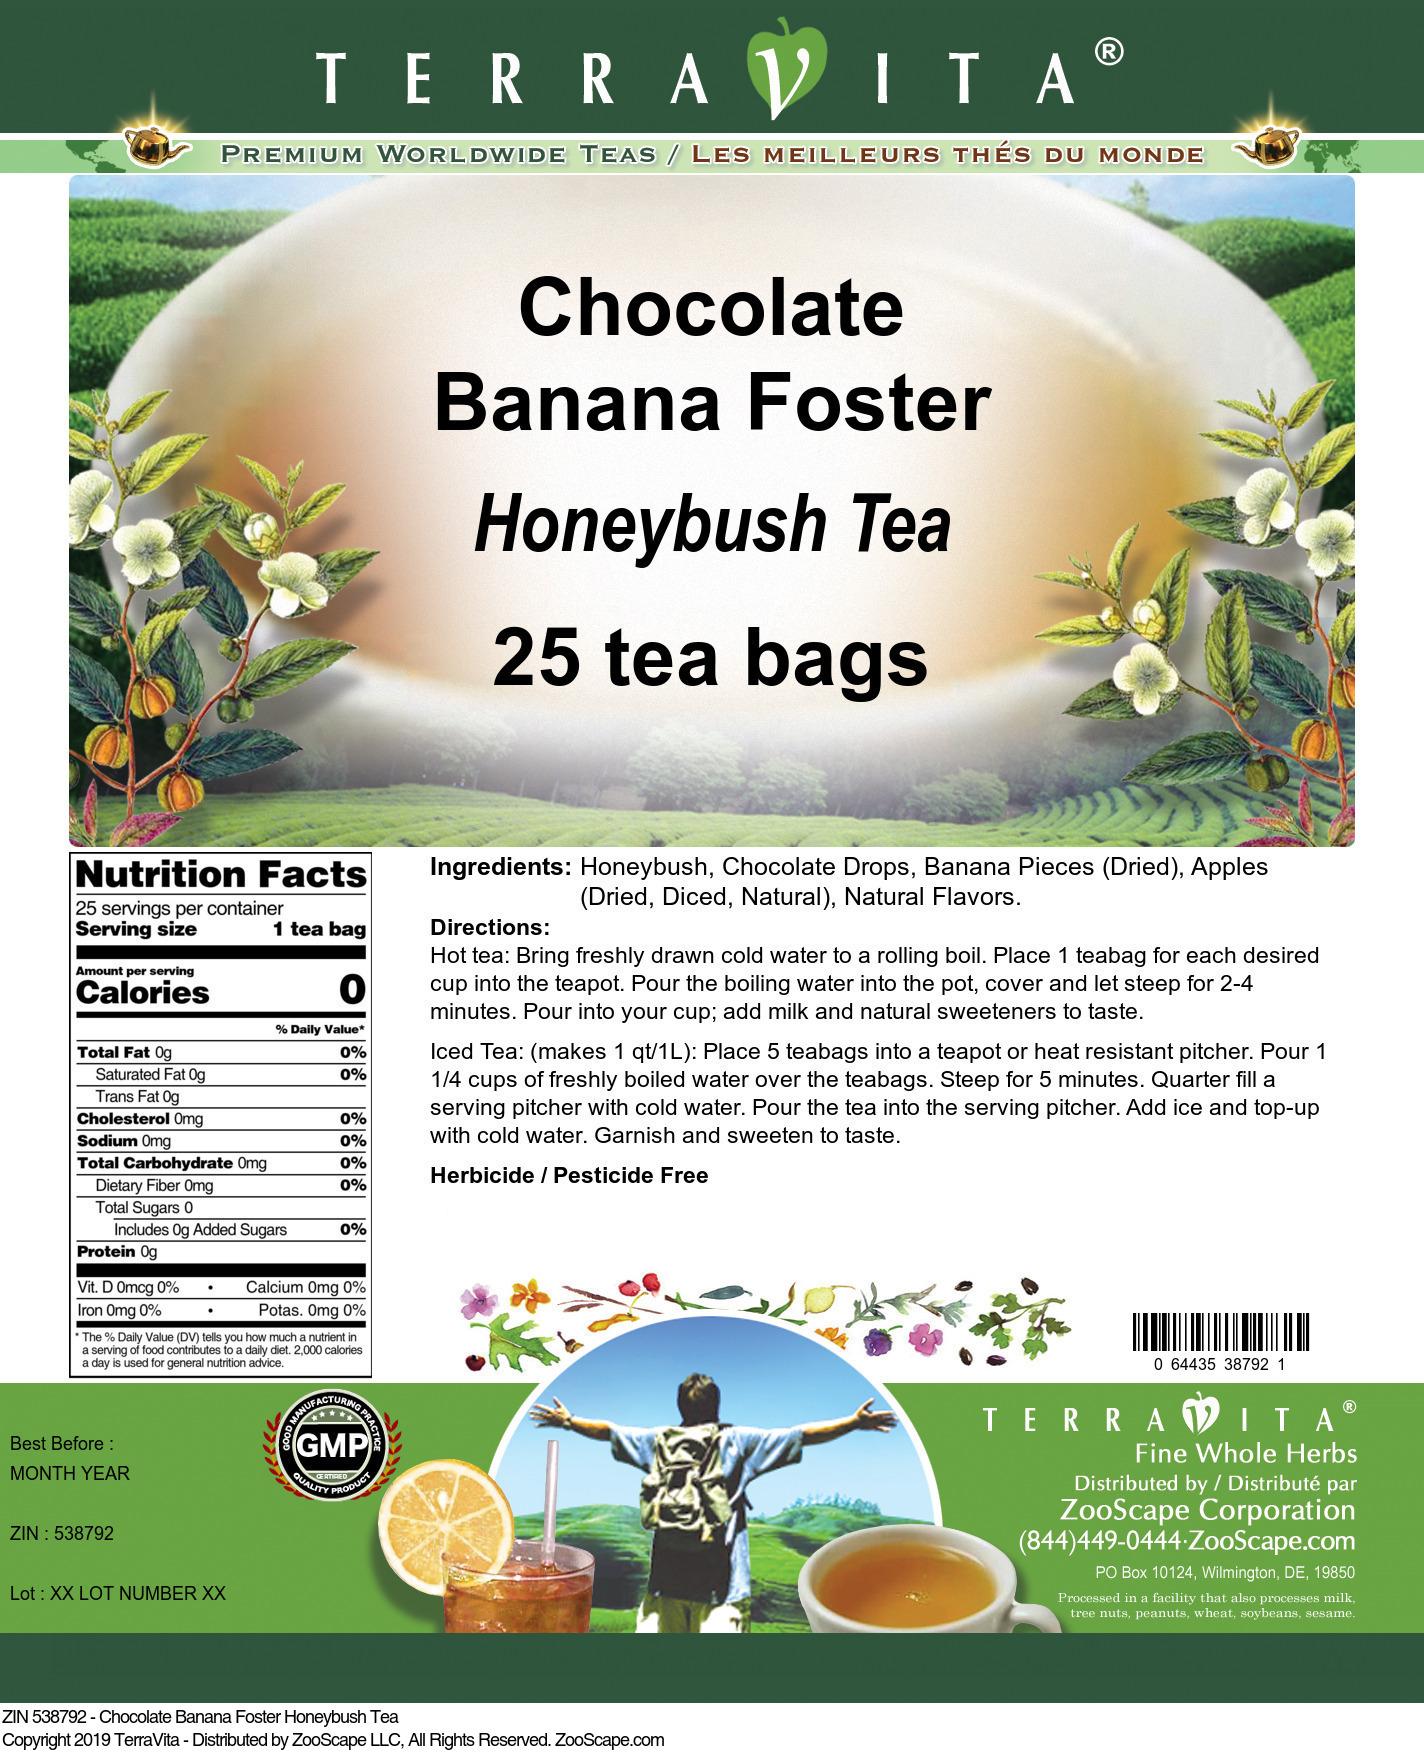 Chocolate Banana Foster Honeybush Tea